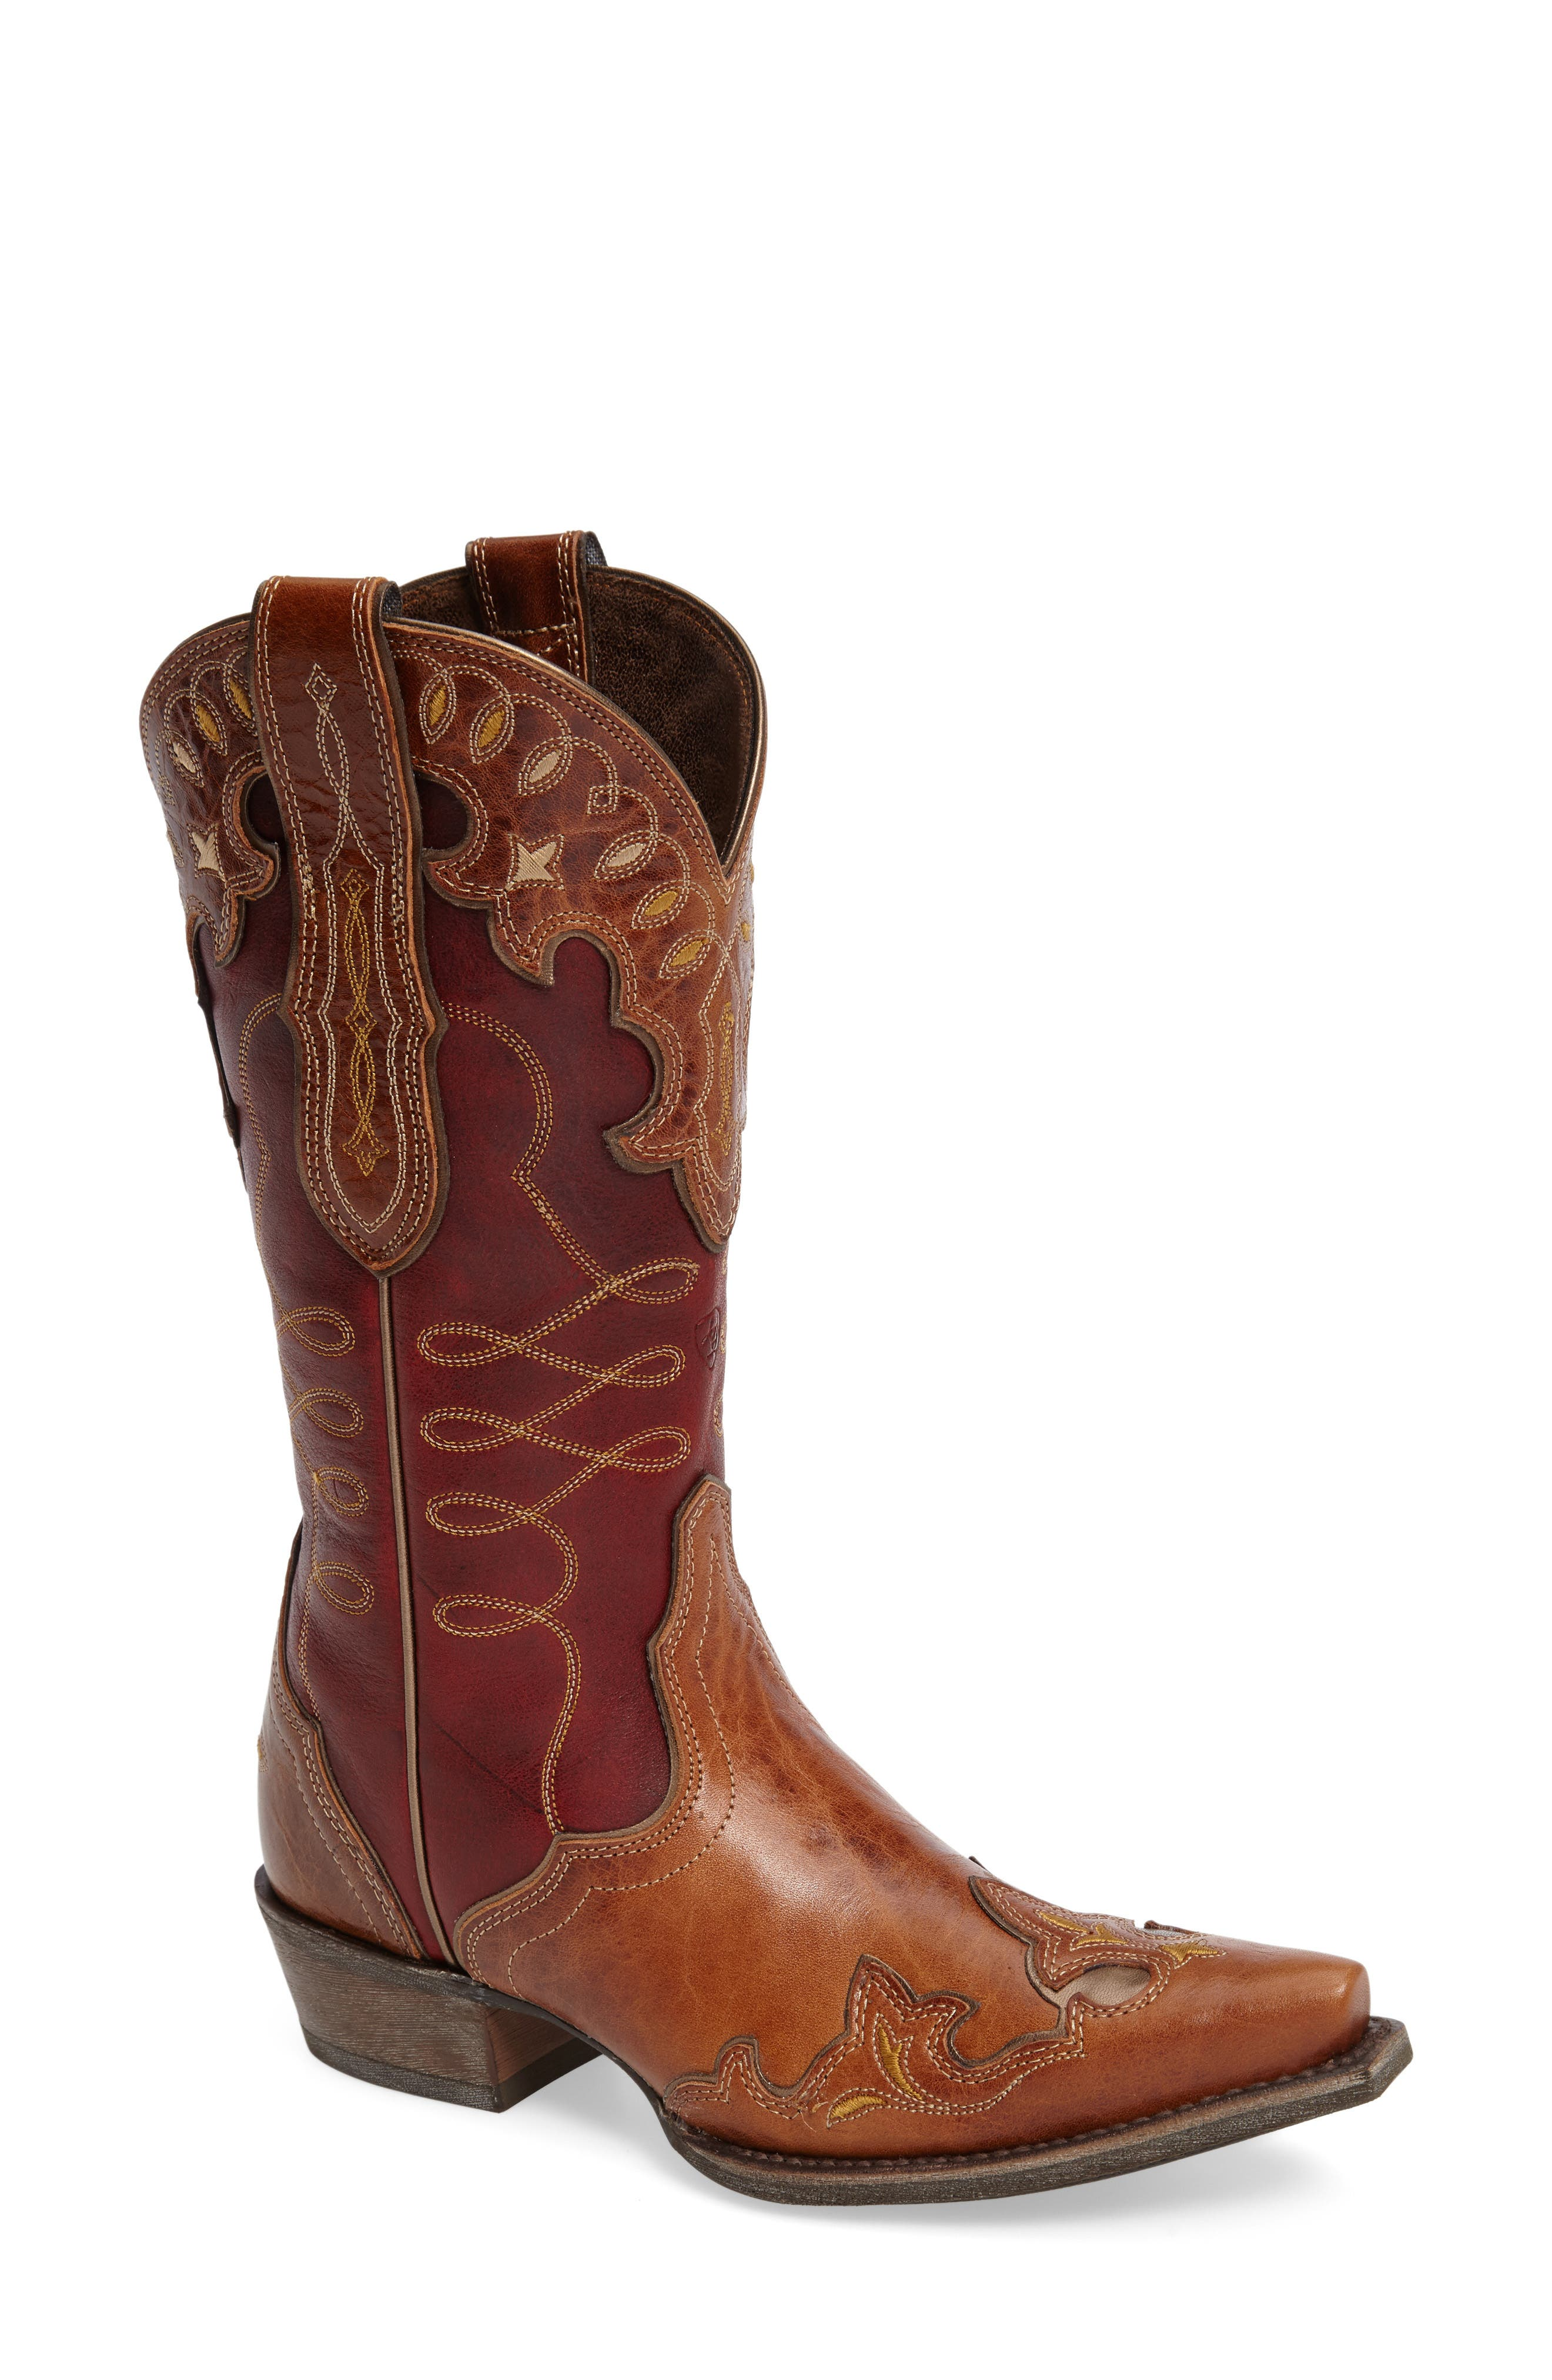 Alternate Image 1 Selected - Ariat Zealous Wingtip Western Boot (Women)